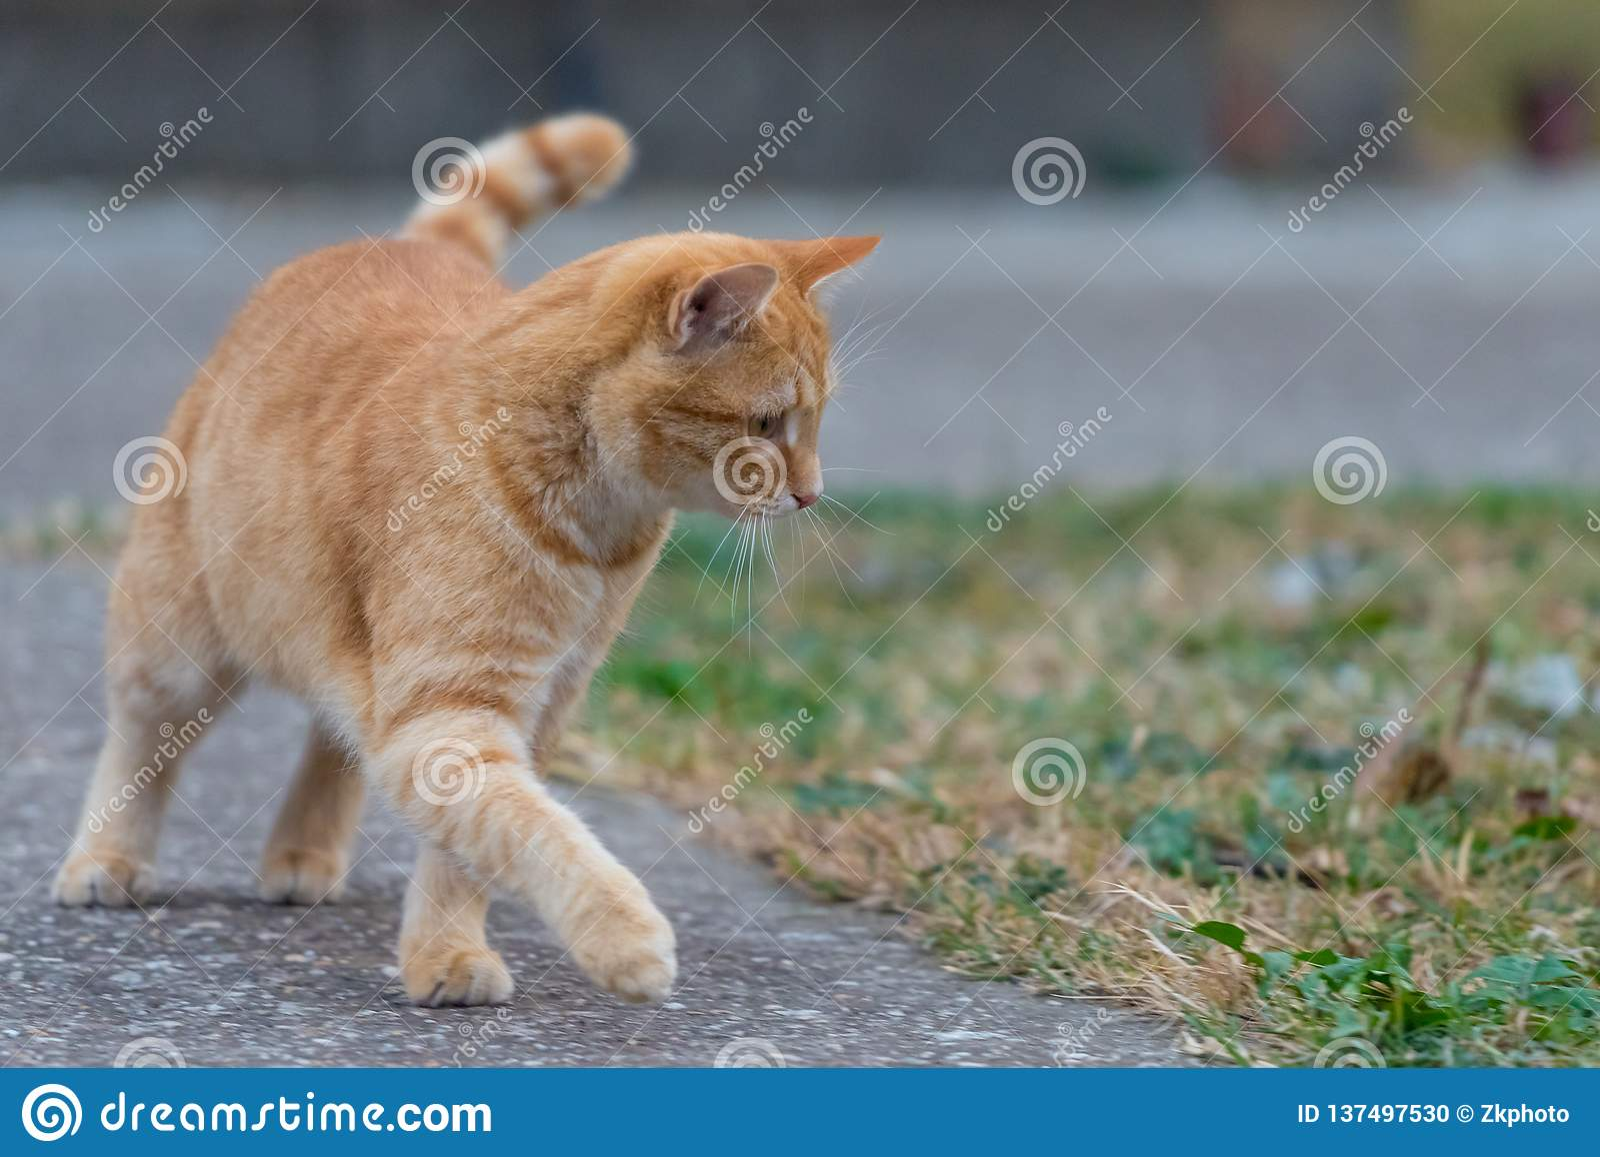 Yellow cat walking throw the yard next to grass